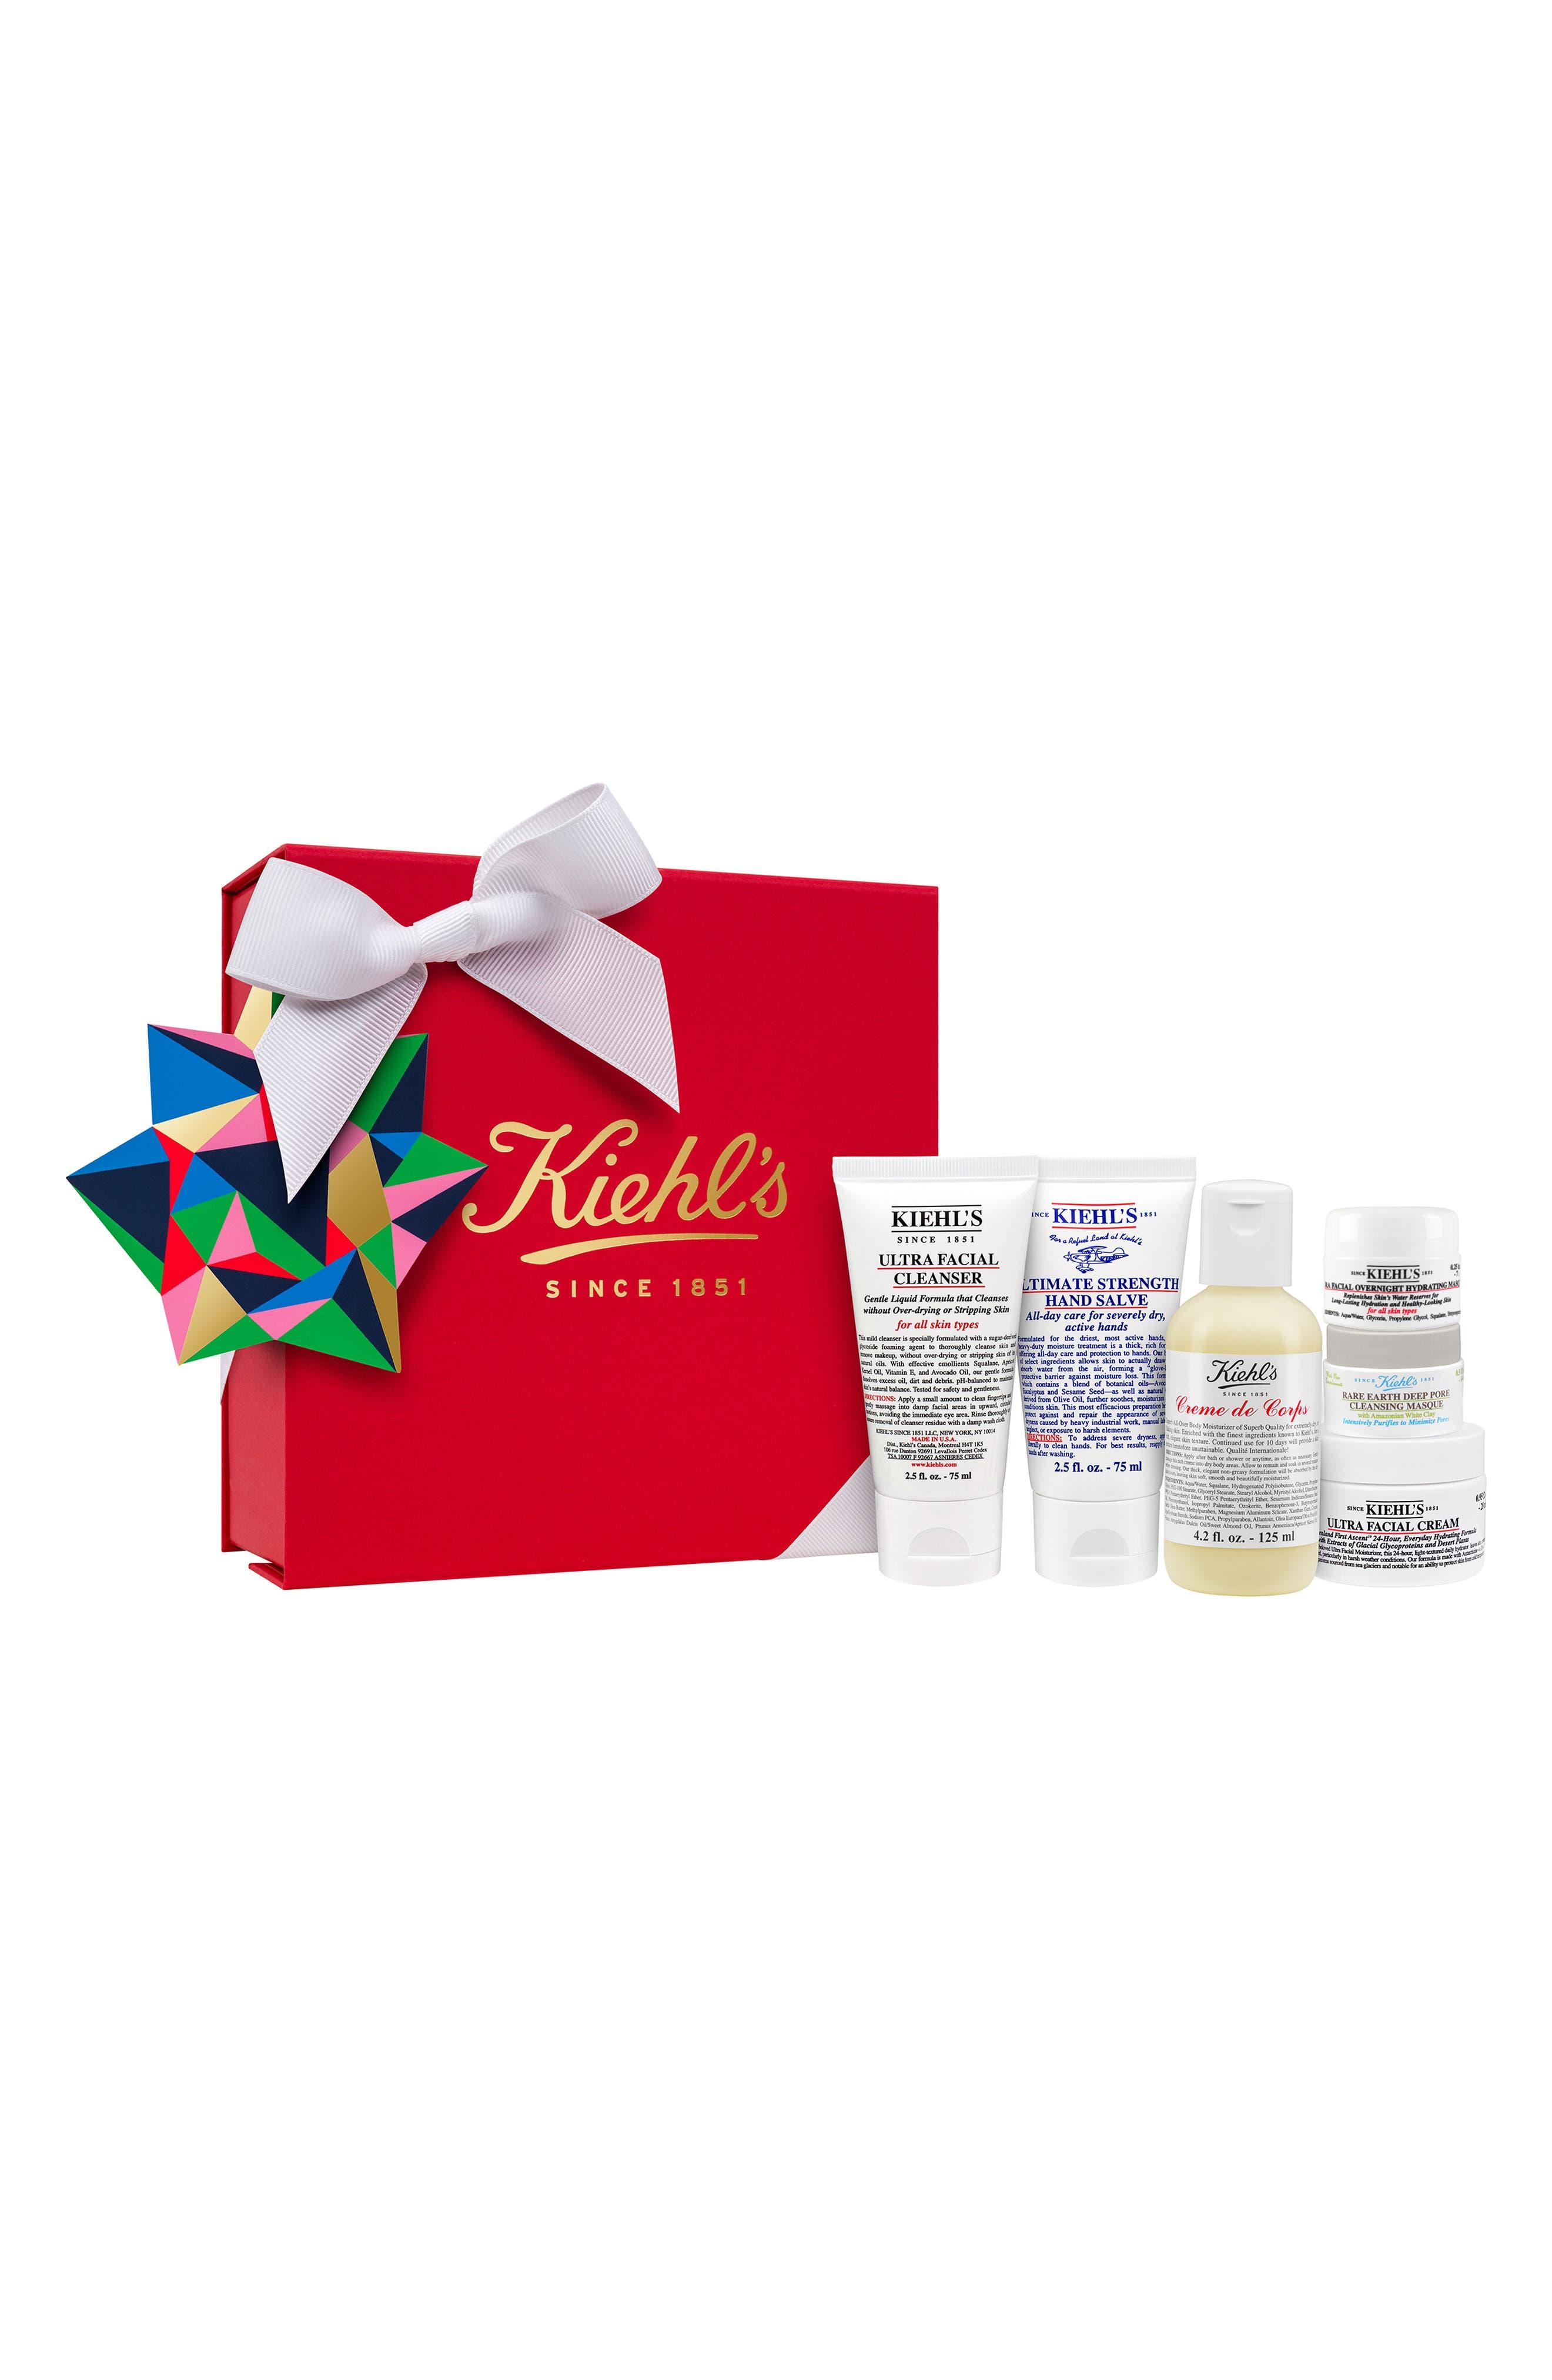 1851 Best Of Kiehl'S Gift Set ($66 Value) in H18